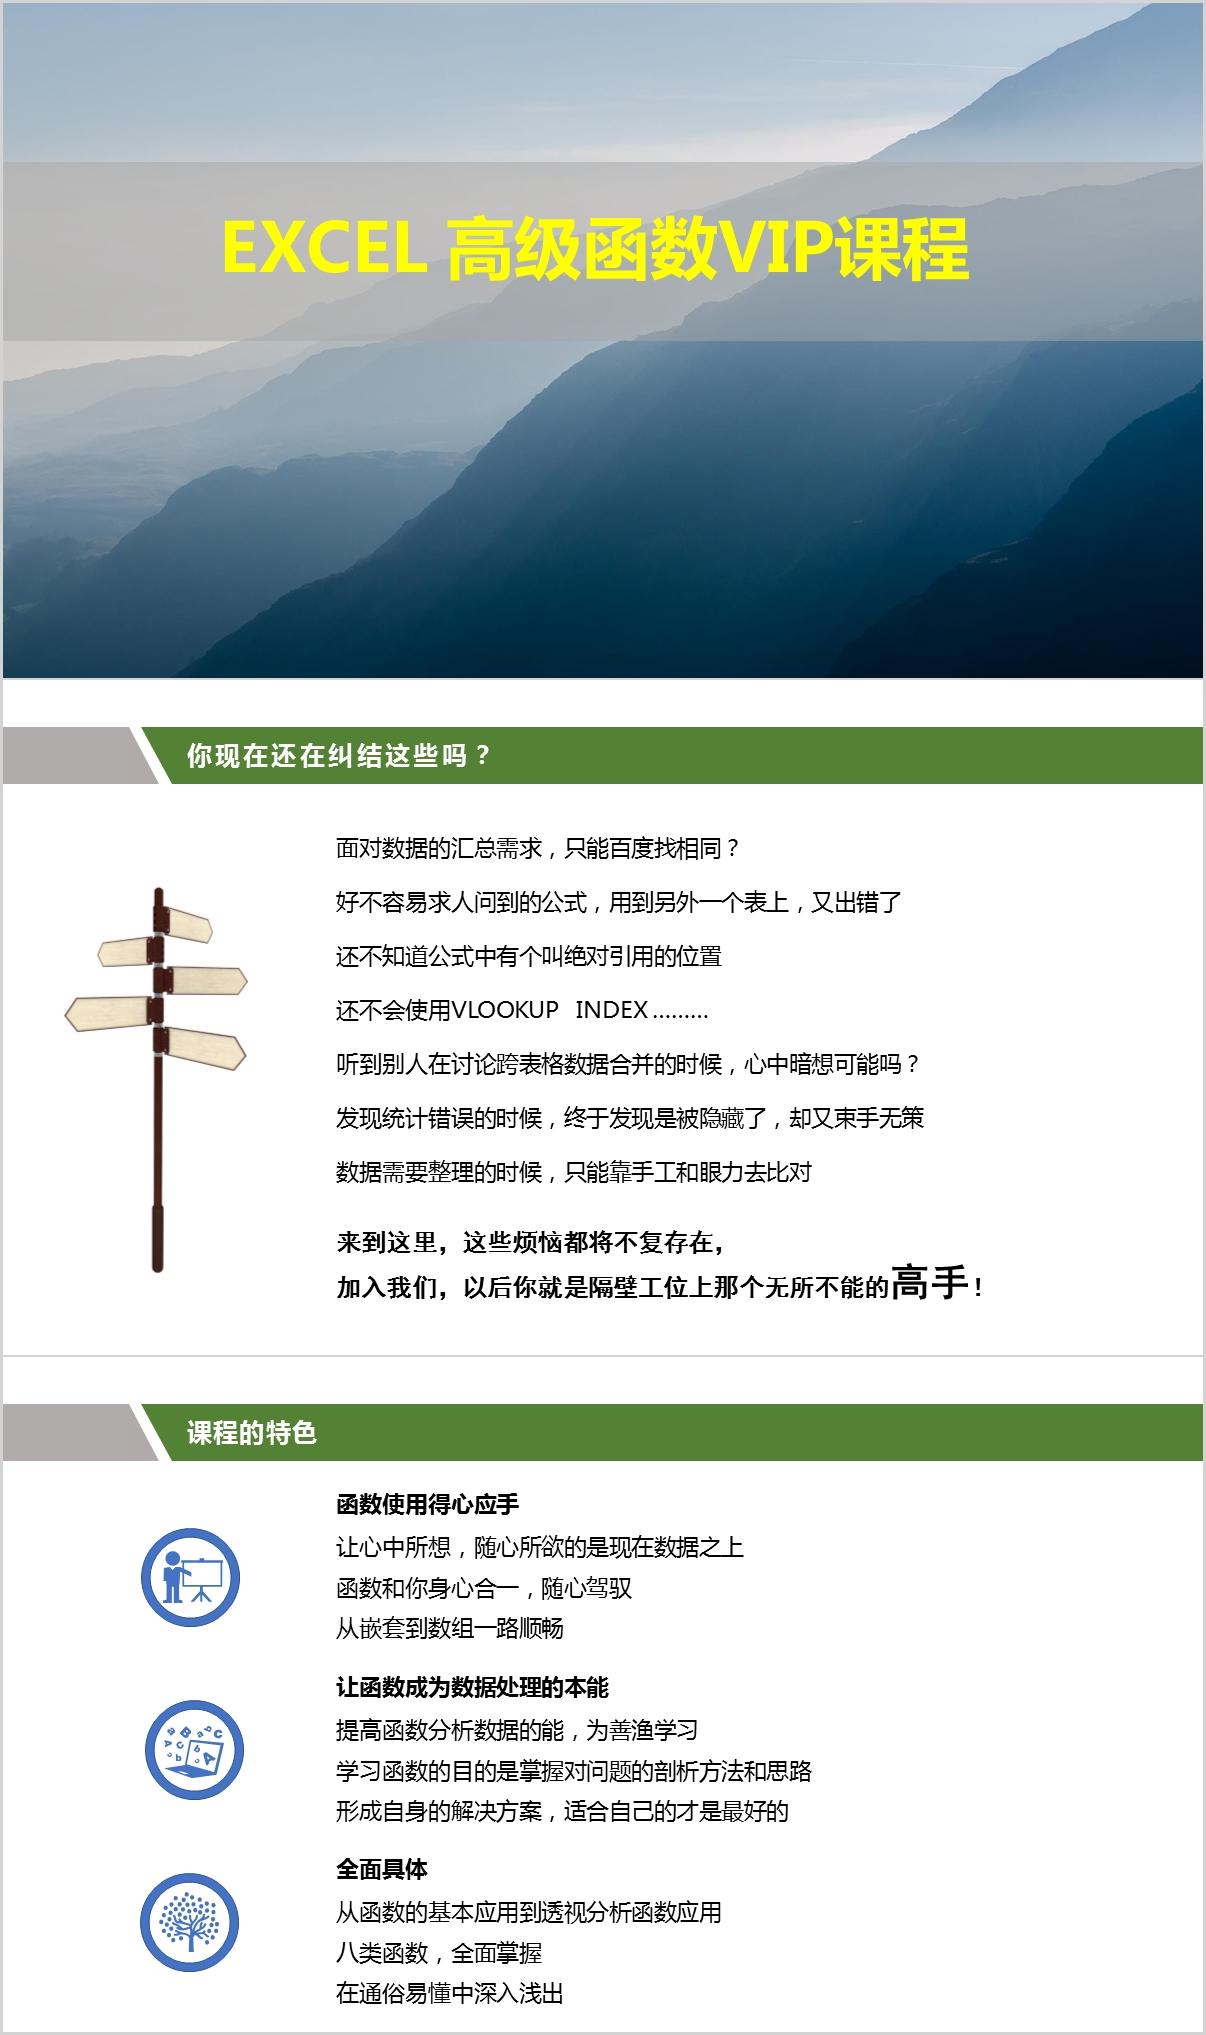 VIP函数文案改进1-3.jpg